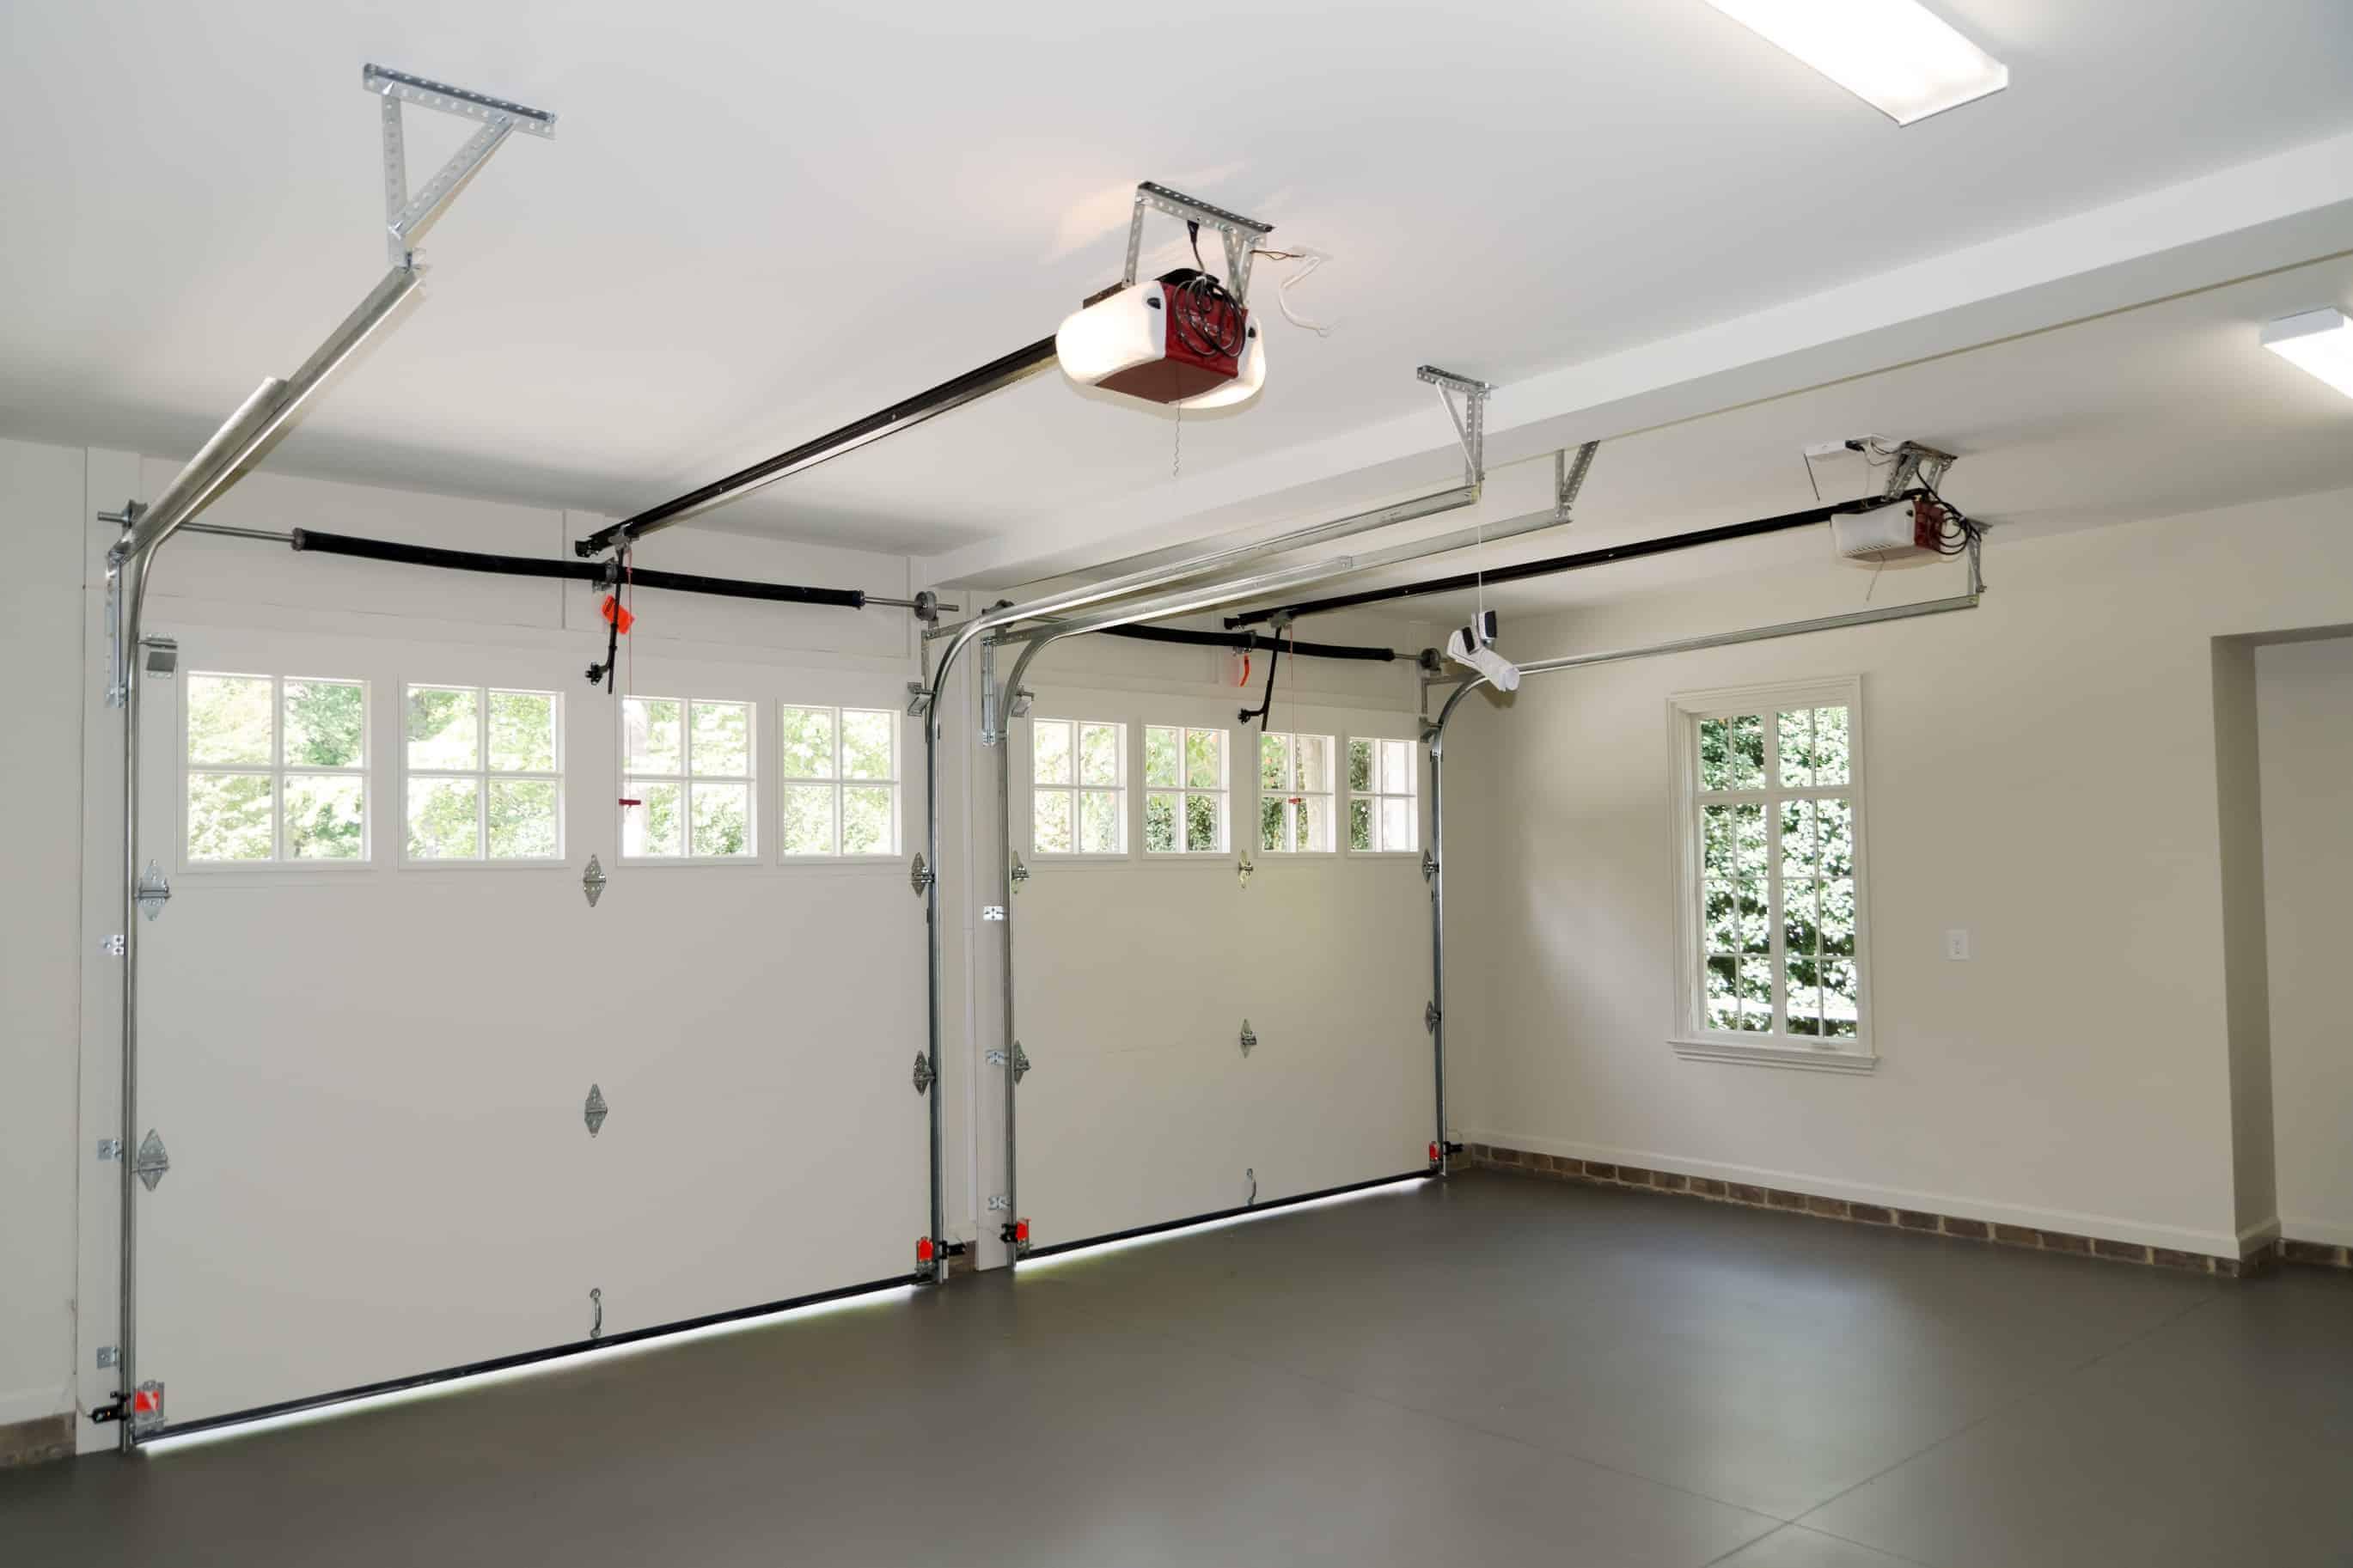 DuPont WA Garage Door Repair & Replacement